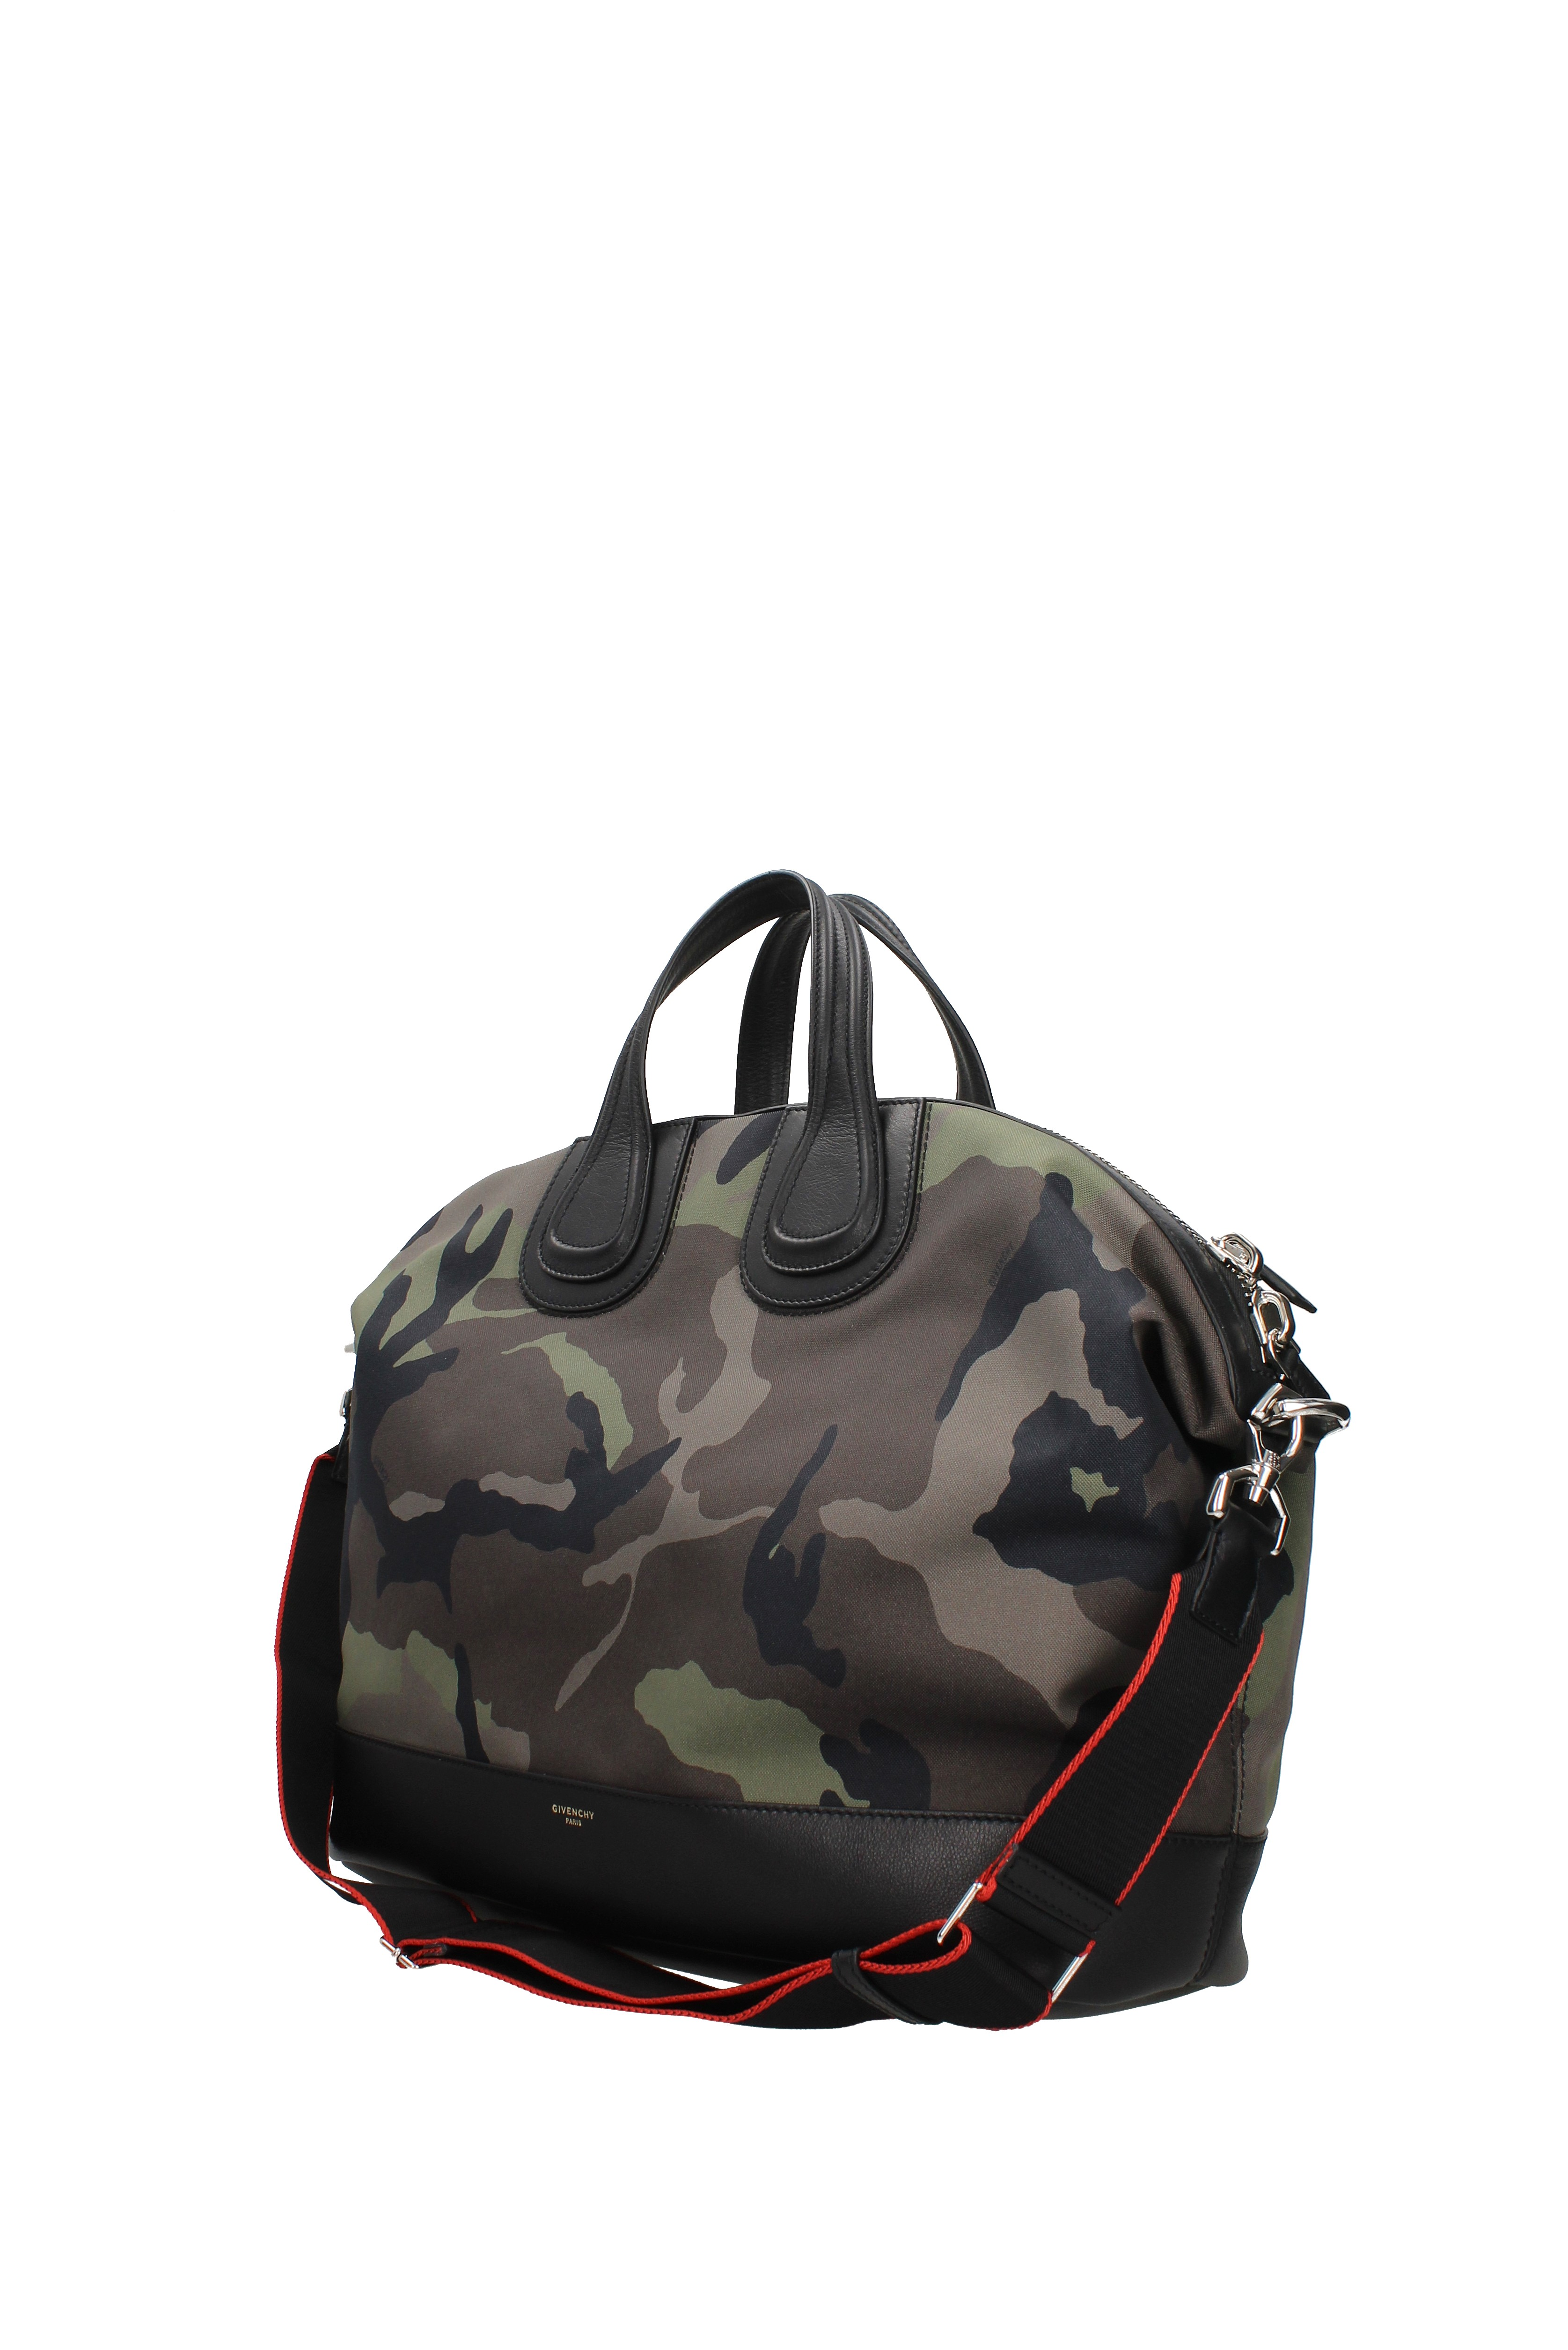 1a20e57af7 Travel-Bags-Givenchy-Men-Fabric-BK5001K021 thumbnail 5